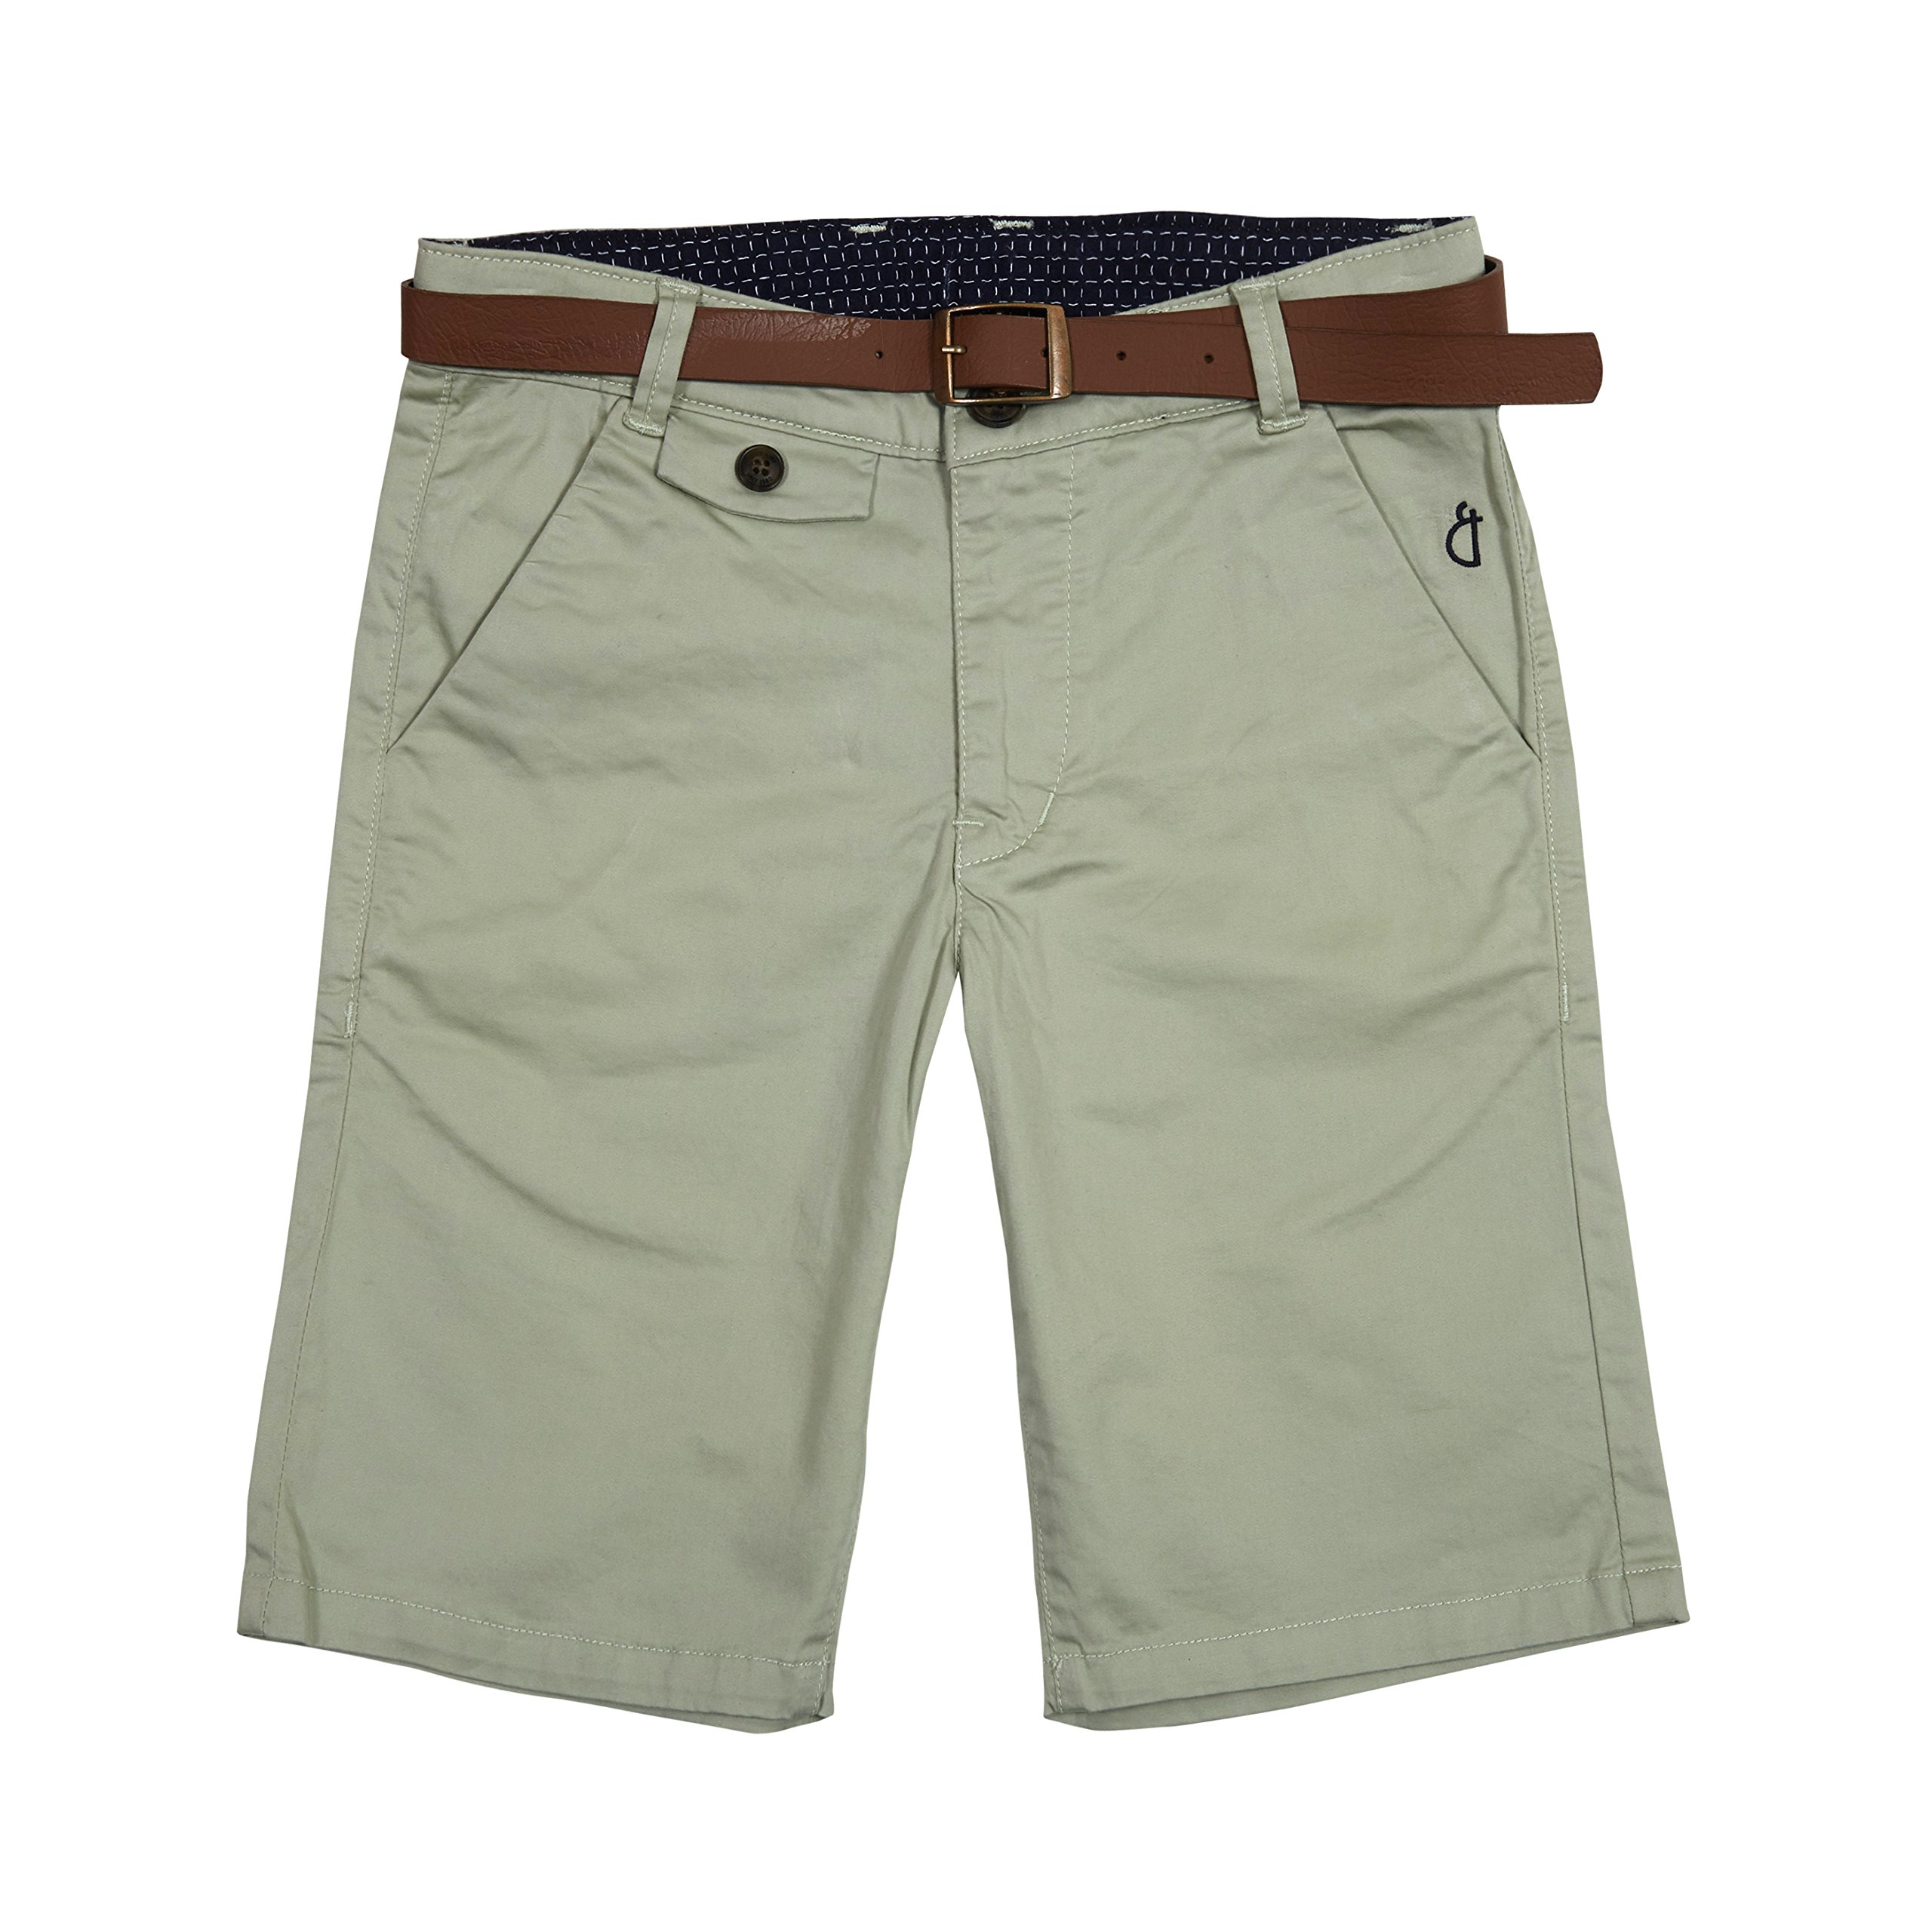 Gini & Jony Little Boys' Shorts 3-4 Years Aqua Glass(C709)